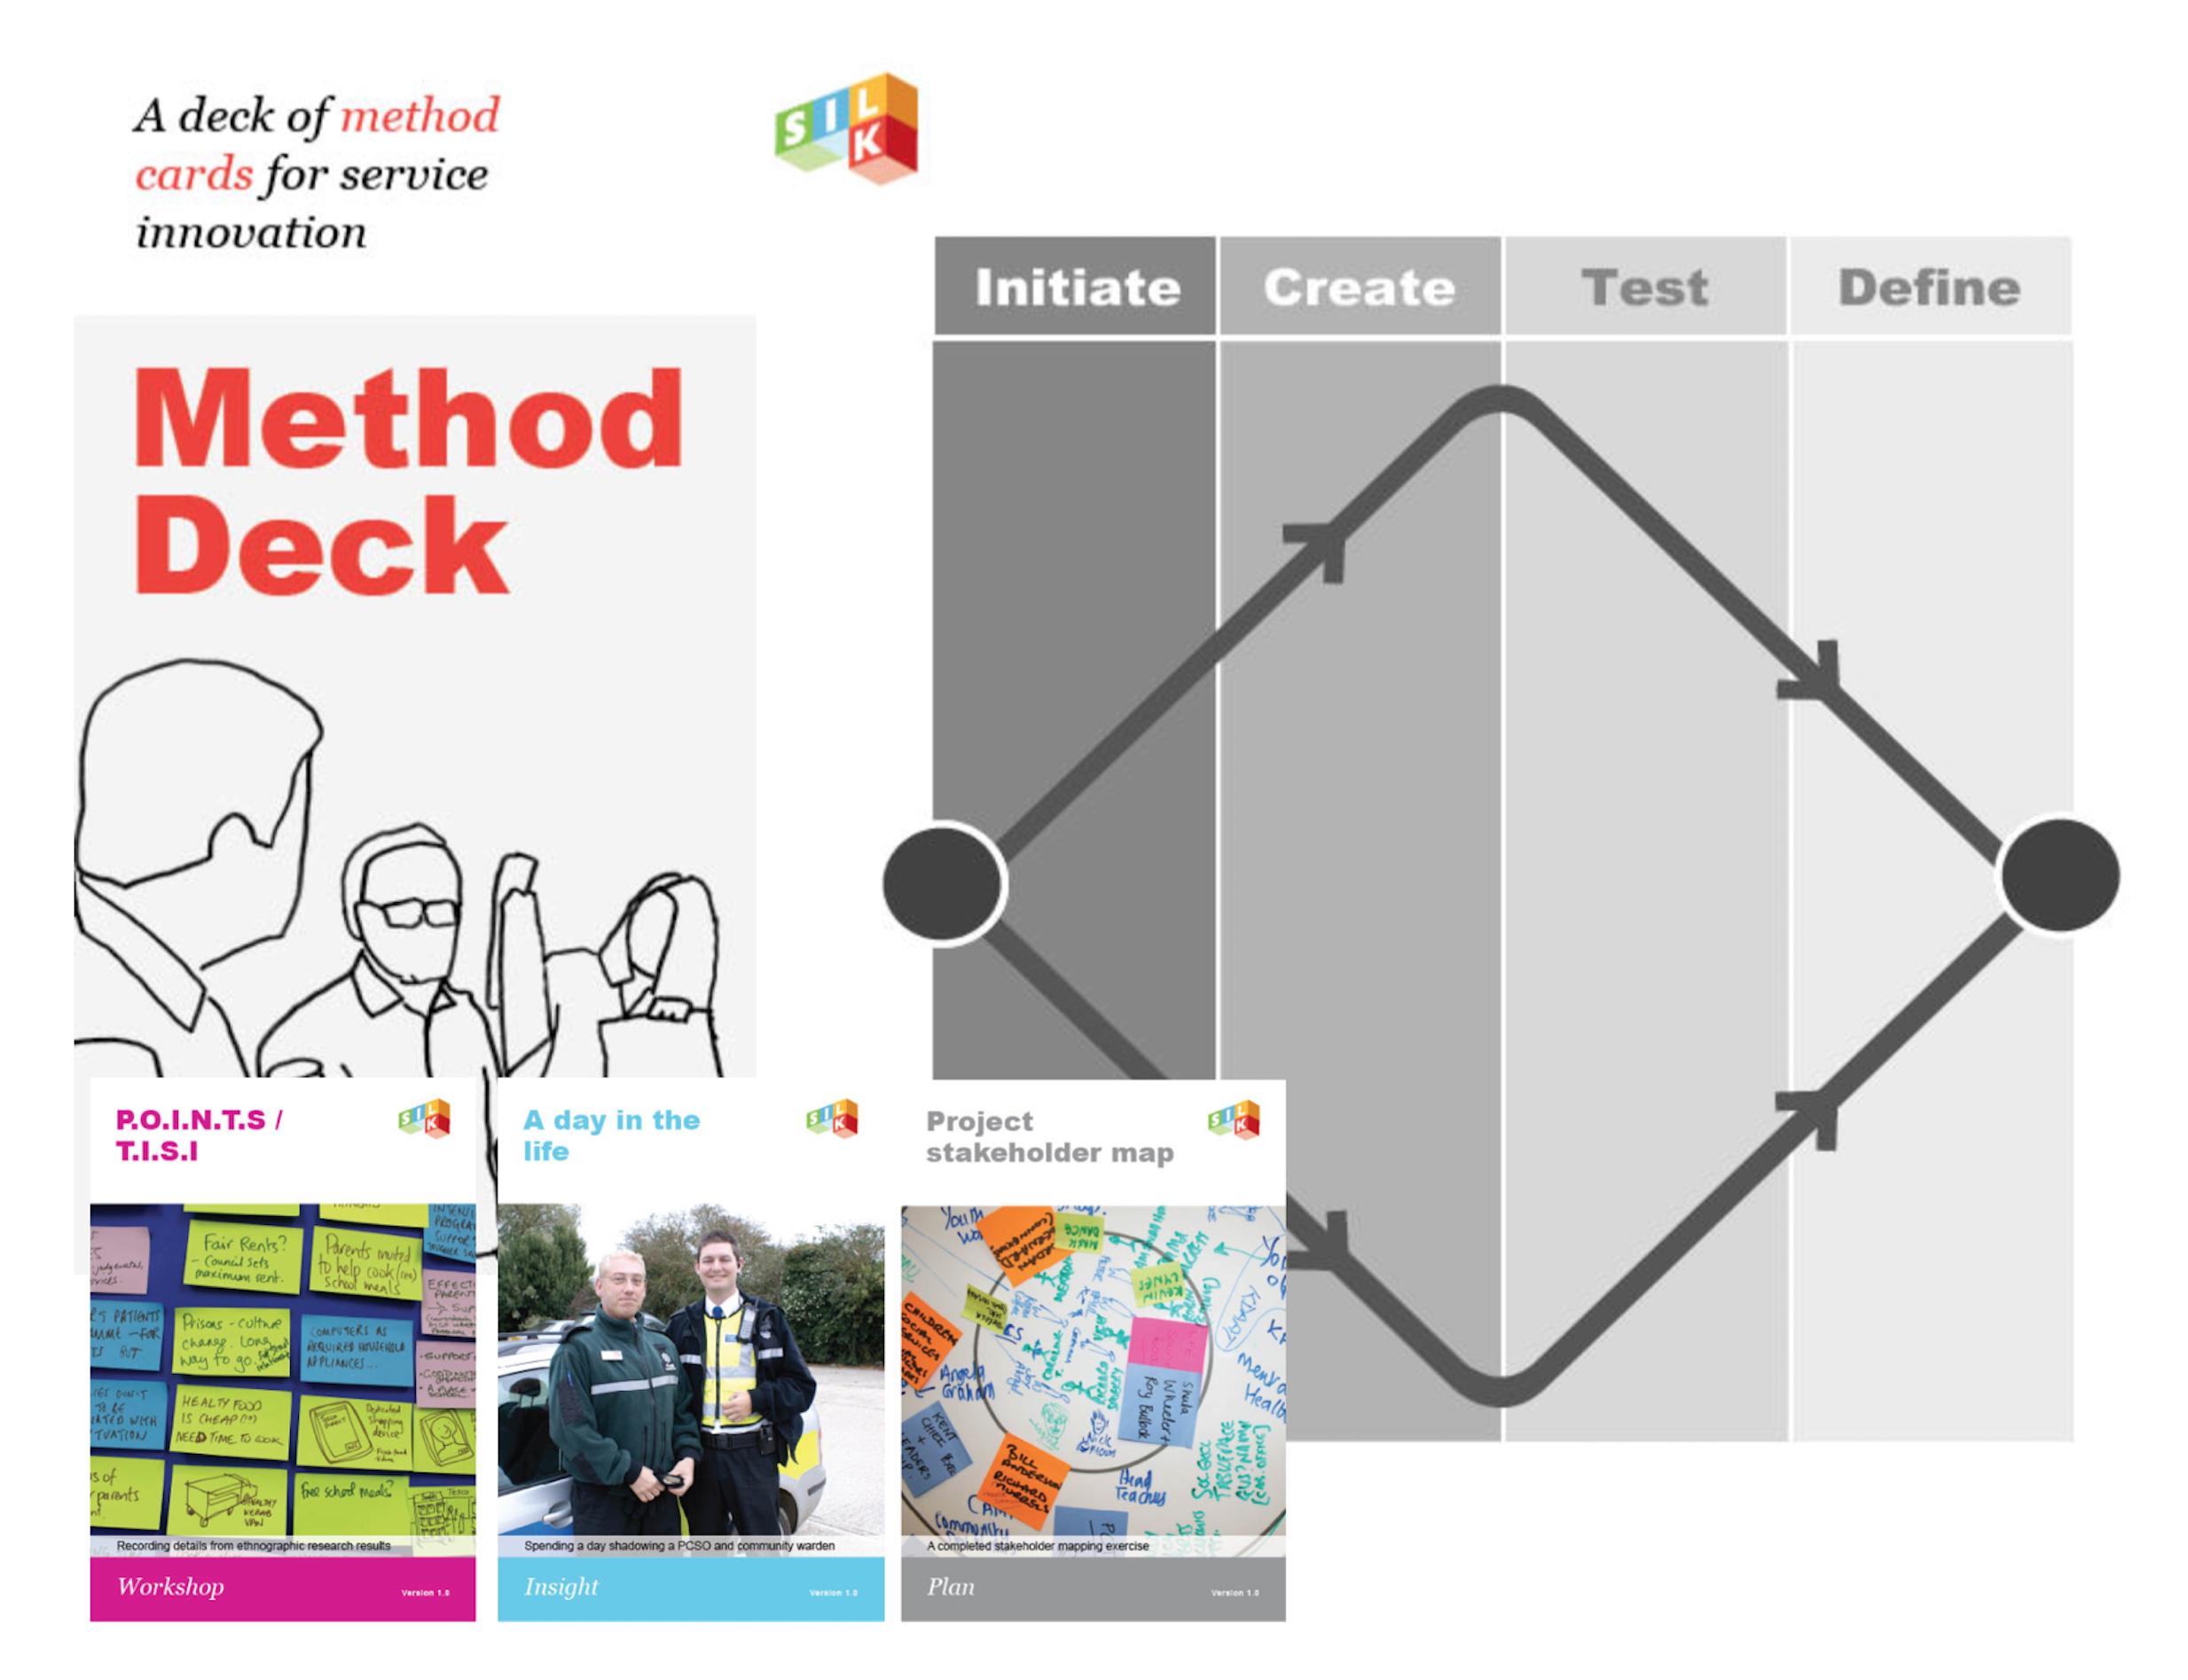 SILK Methodology and Method Deck